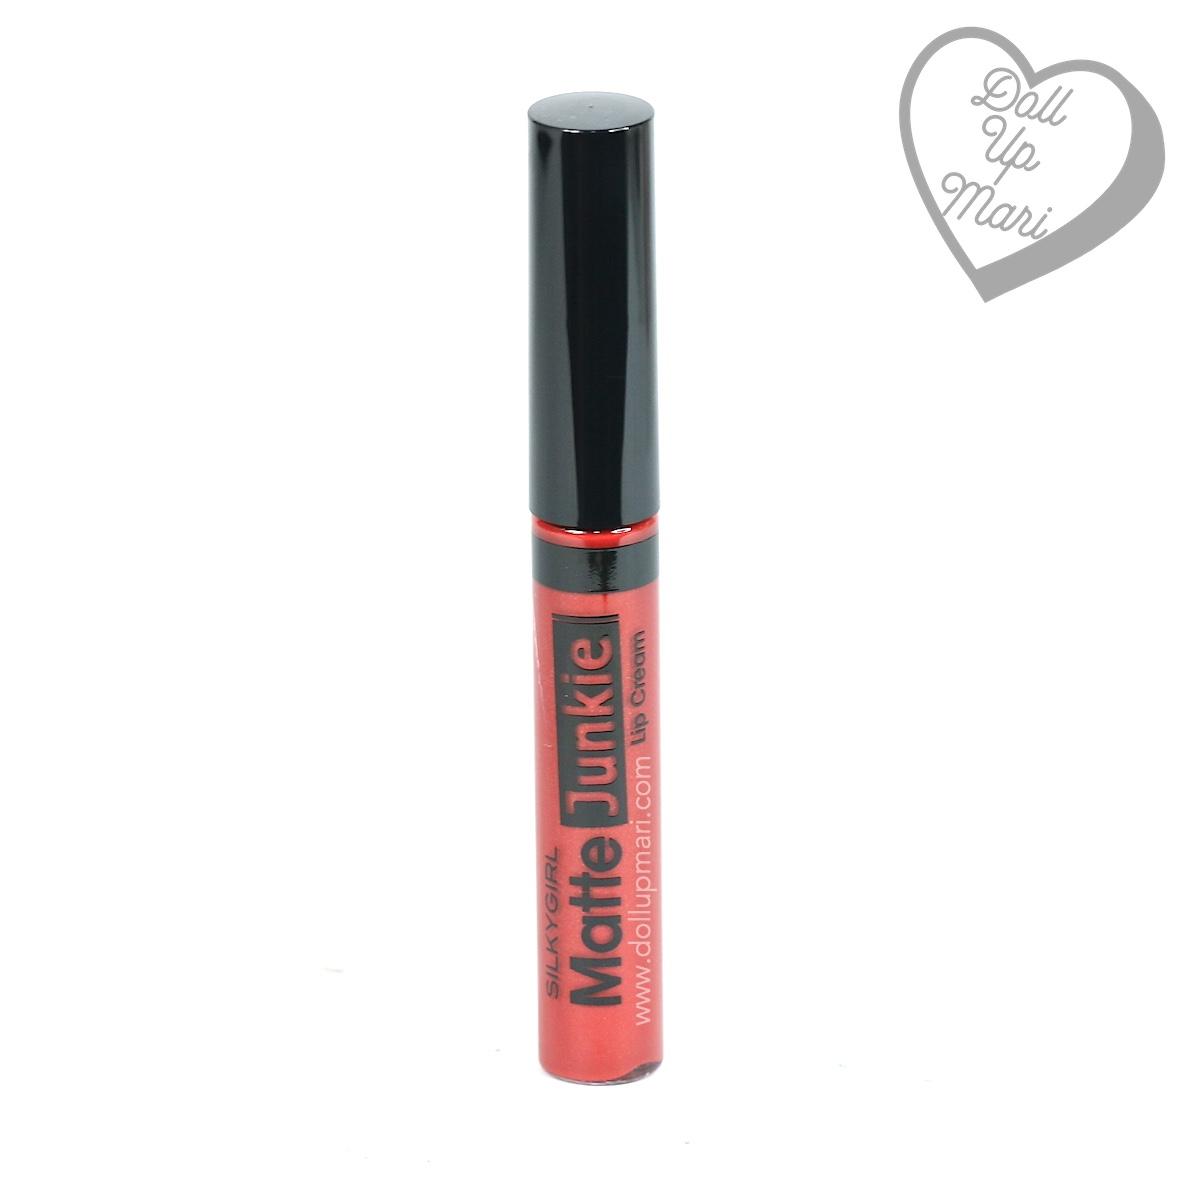 tube of SilkyGirl Matte Junkie Lipcolor (09 Rouge)